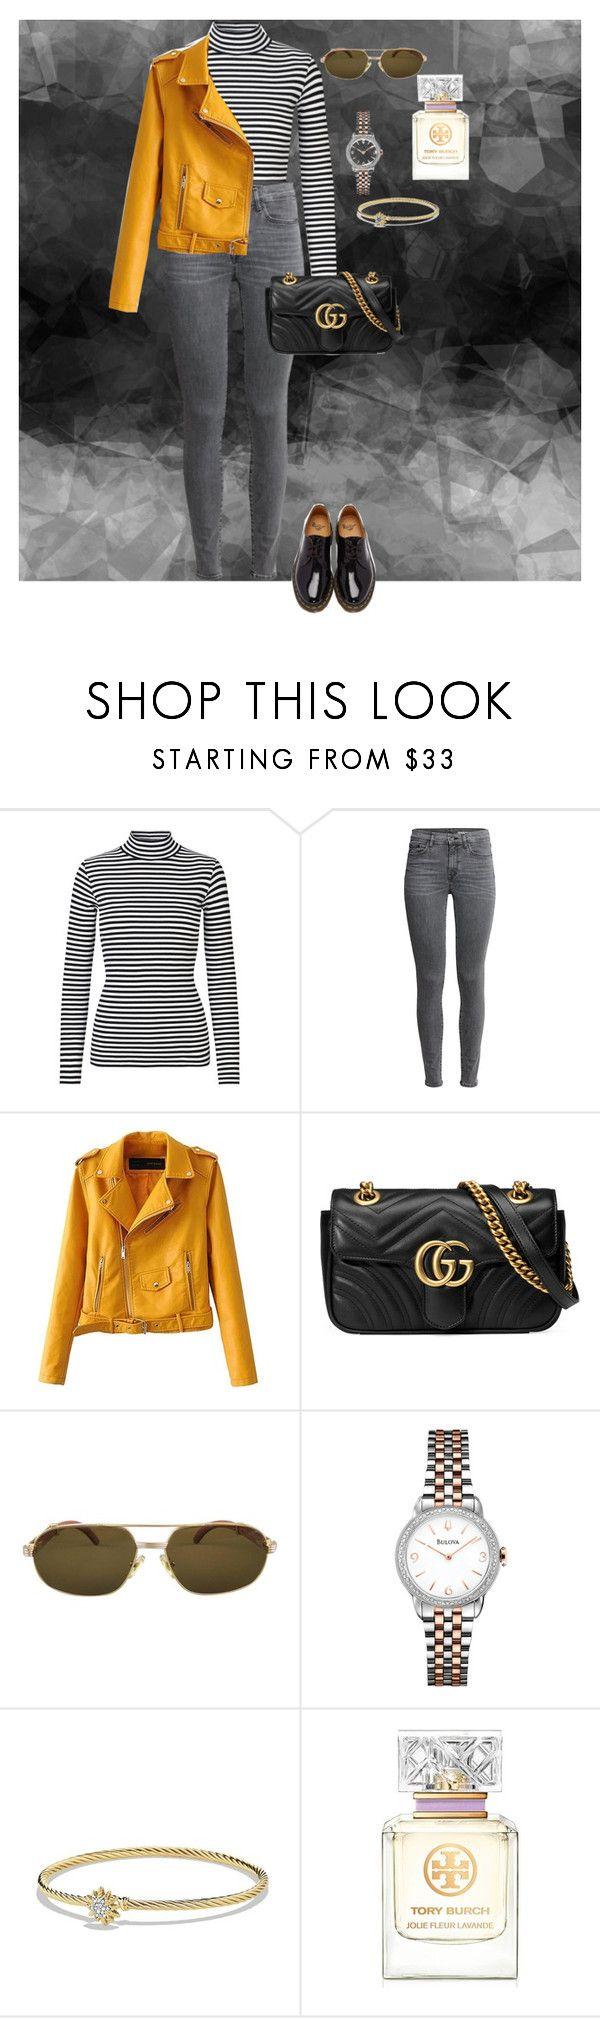 """#375"" by elana-favella-gatoni ❤ liked on Polyvore featuring Gucci, Cartier, Bulova, David Yurman, Tory Burch and Dr. Martens"